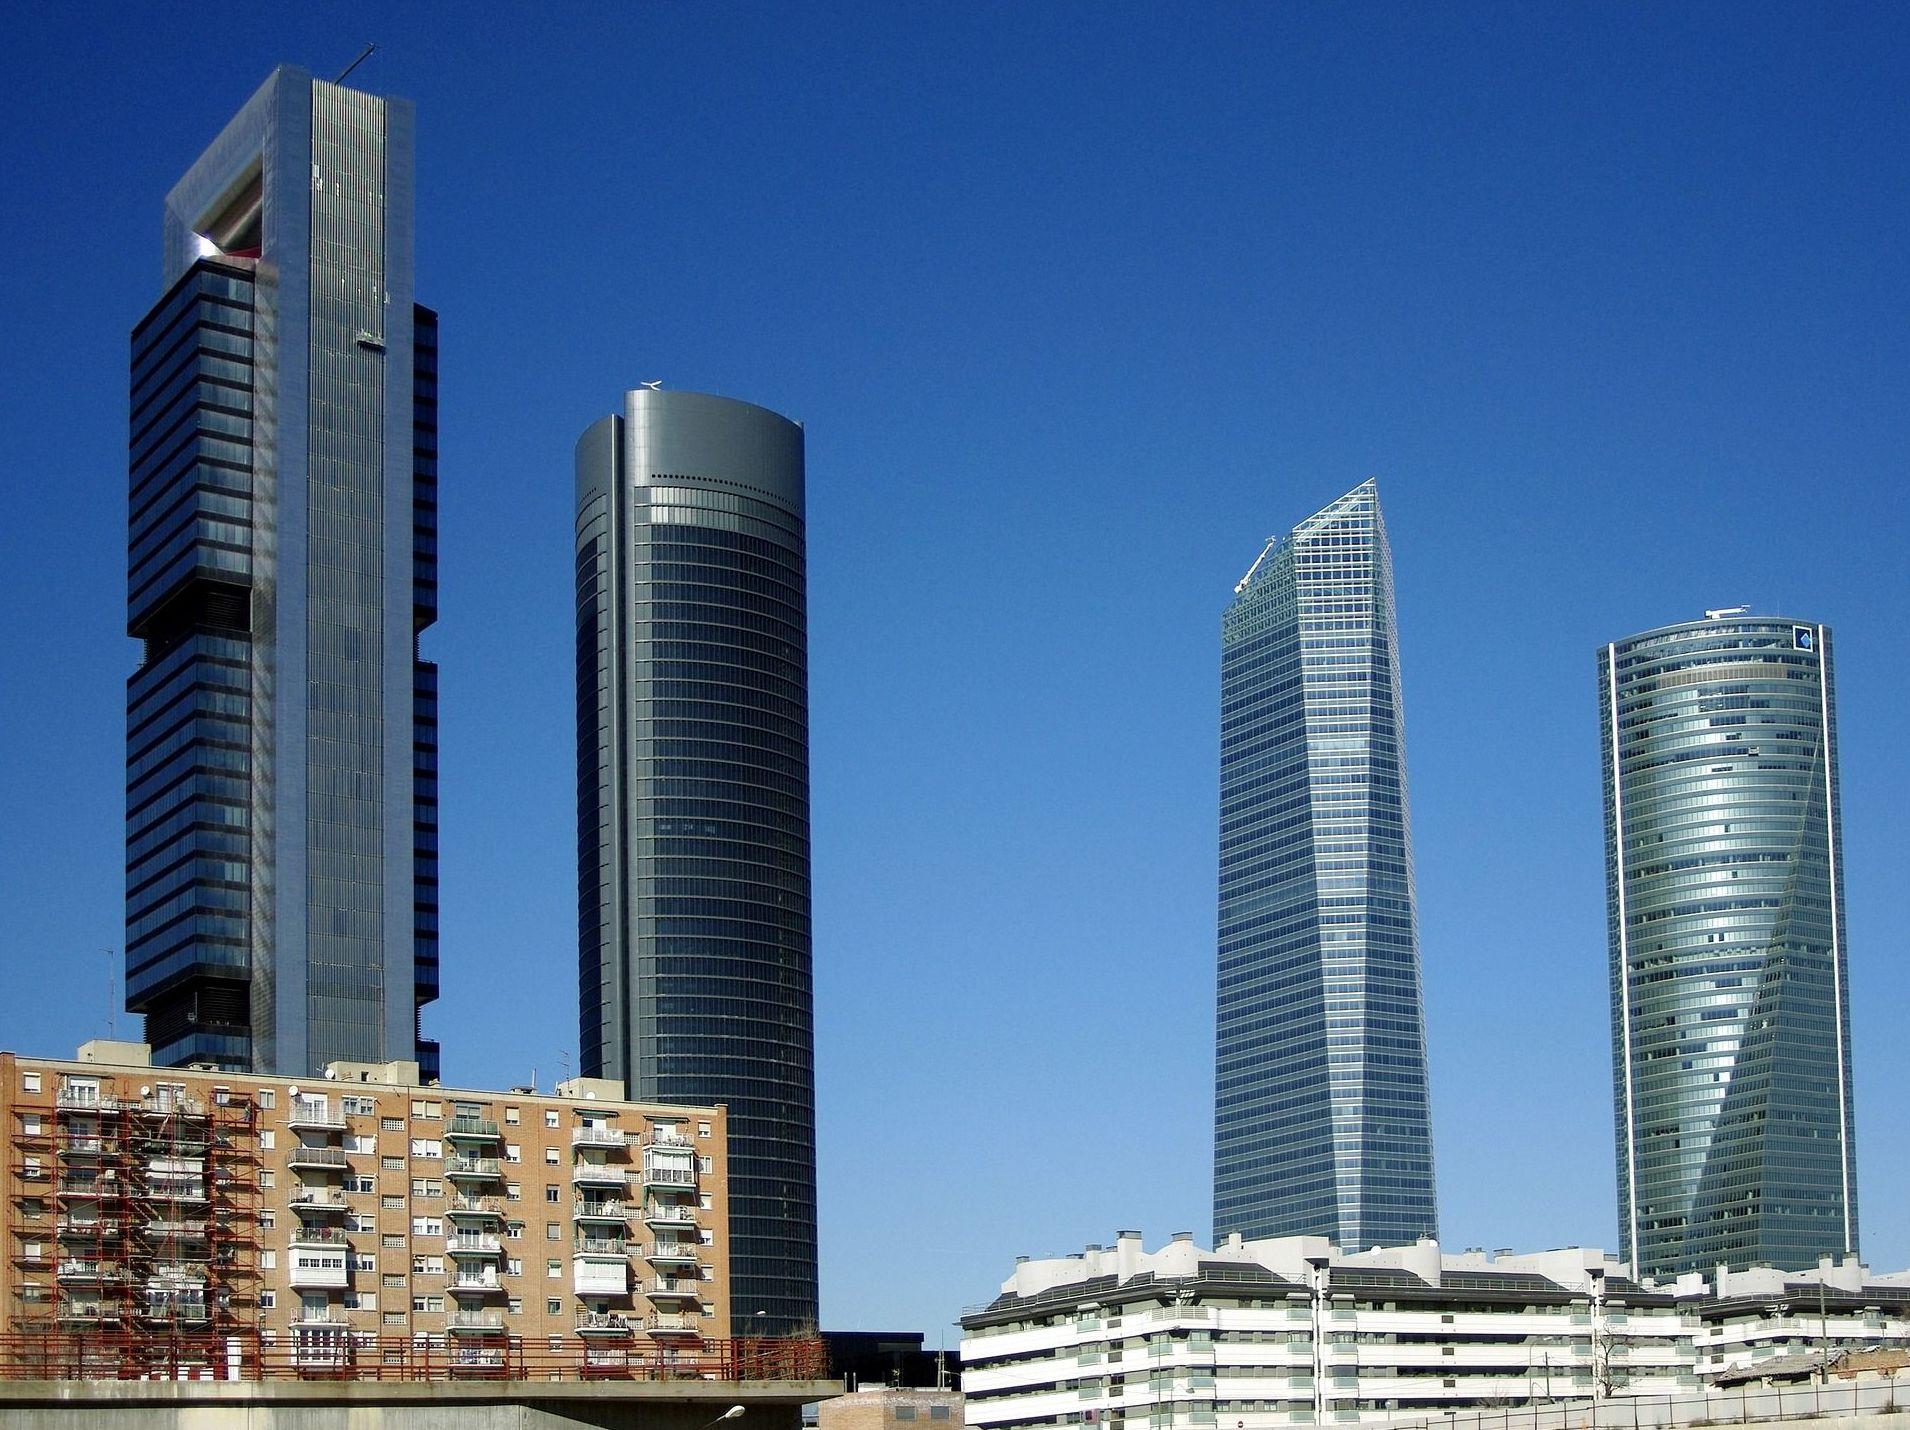 Clases de inglés zona cuatro torres